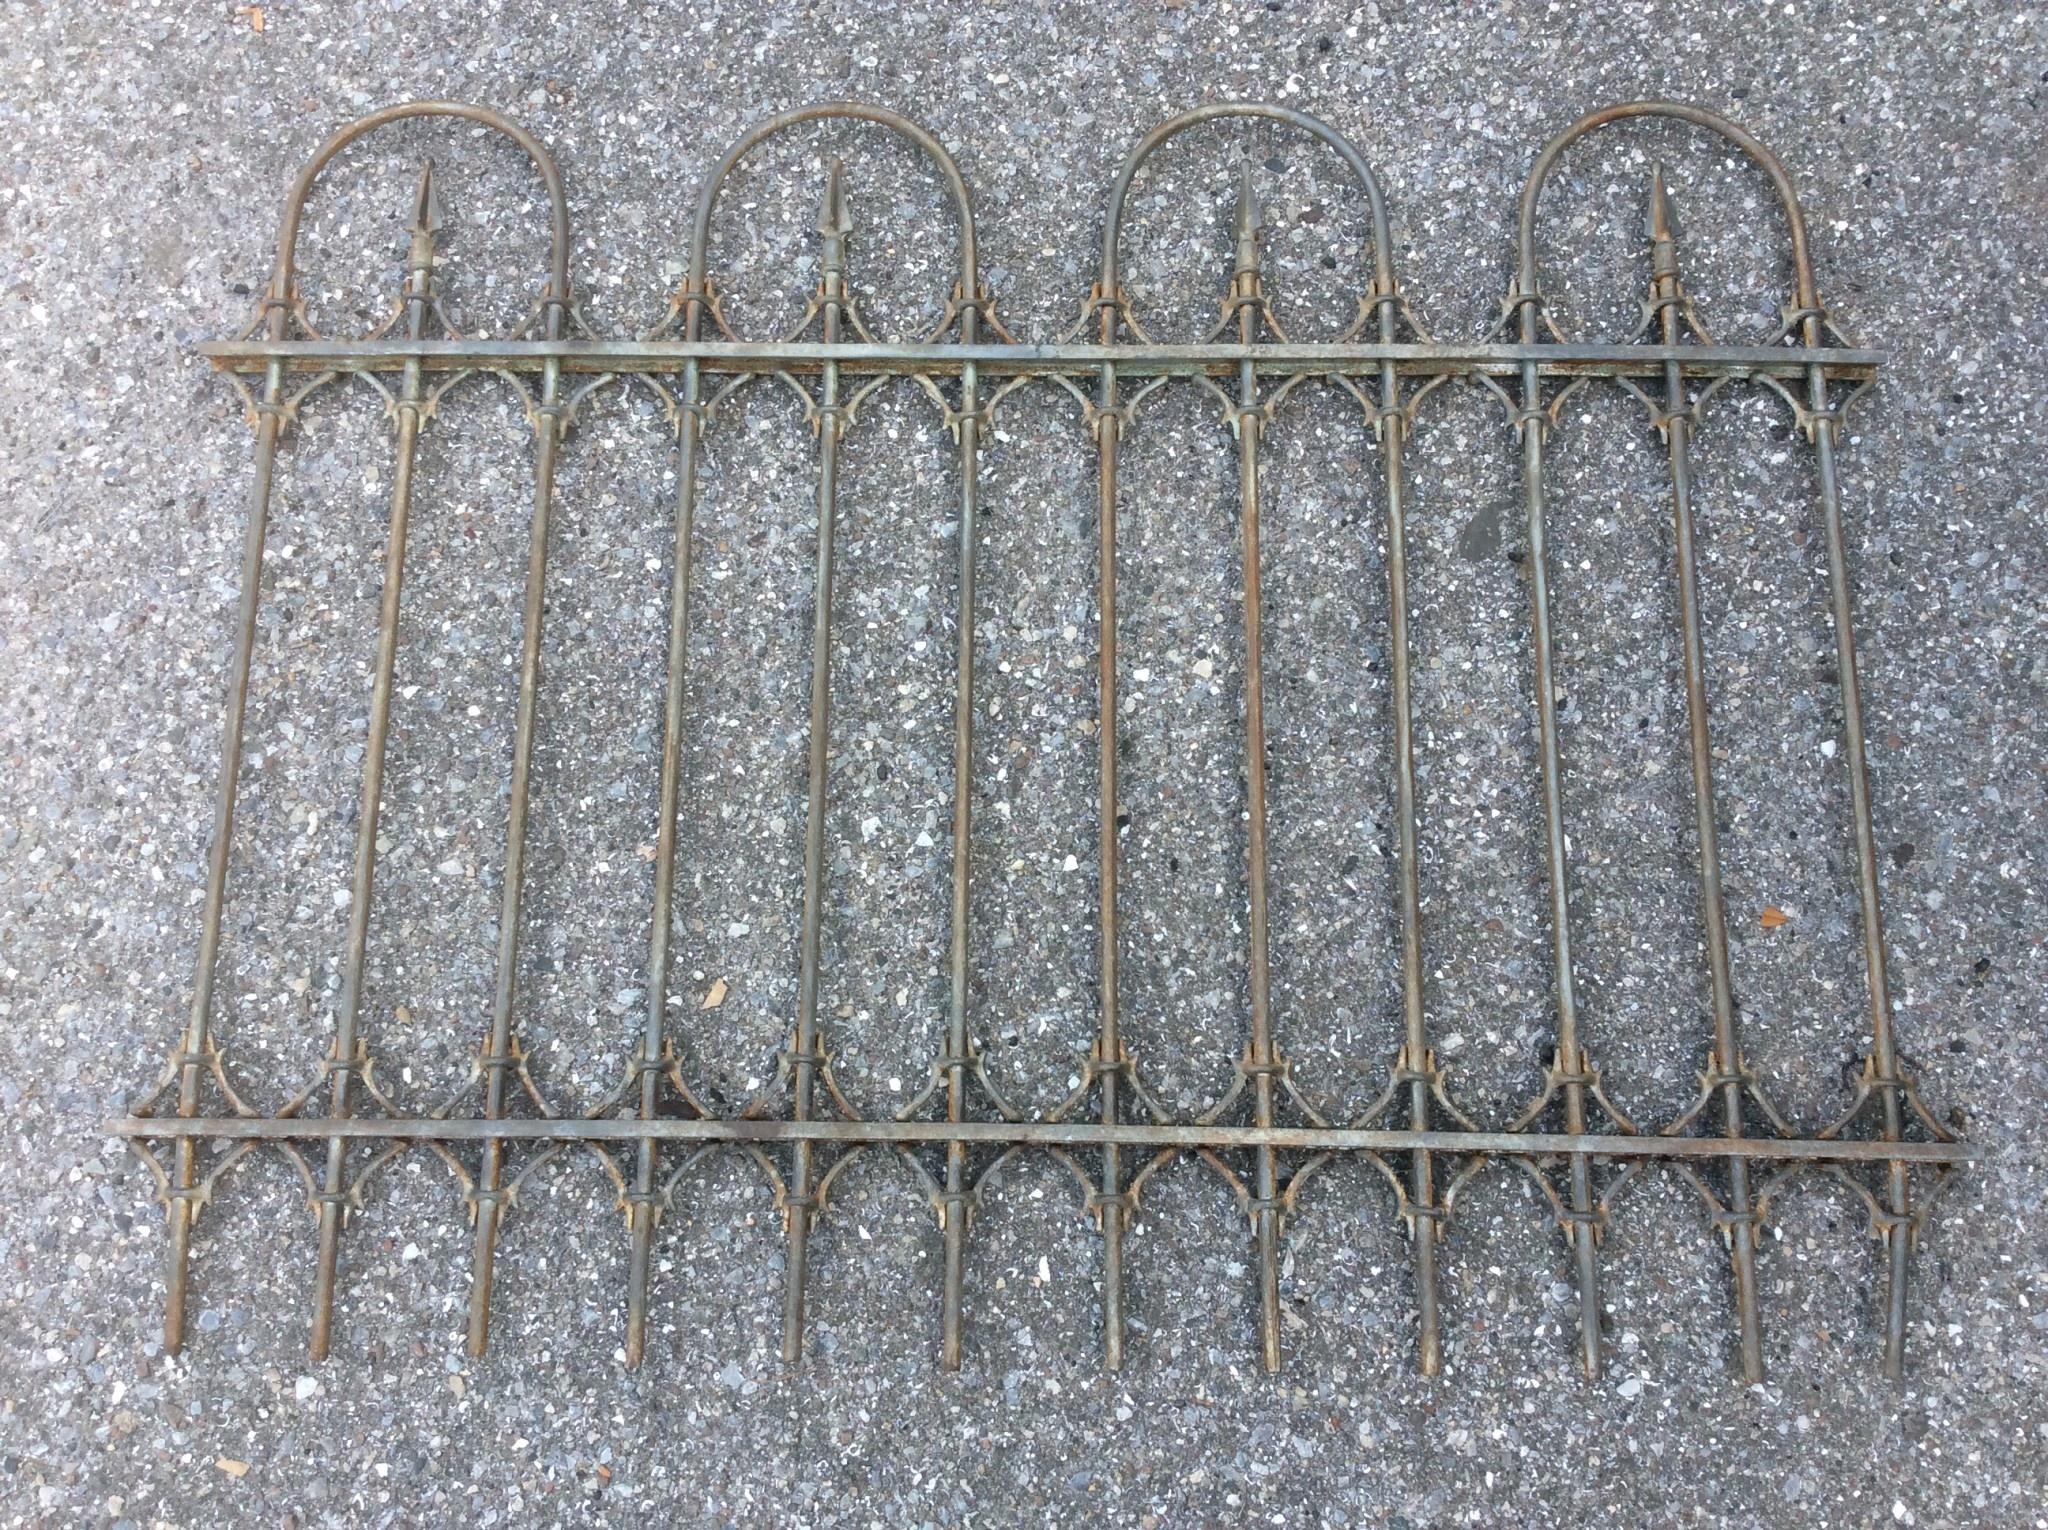 Vintage gate section